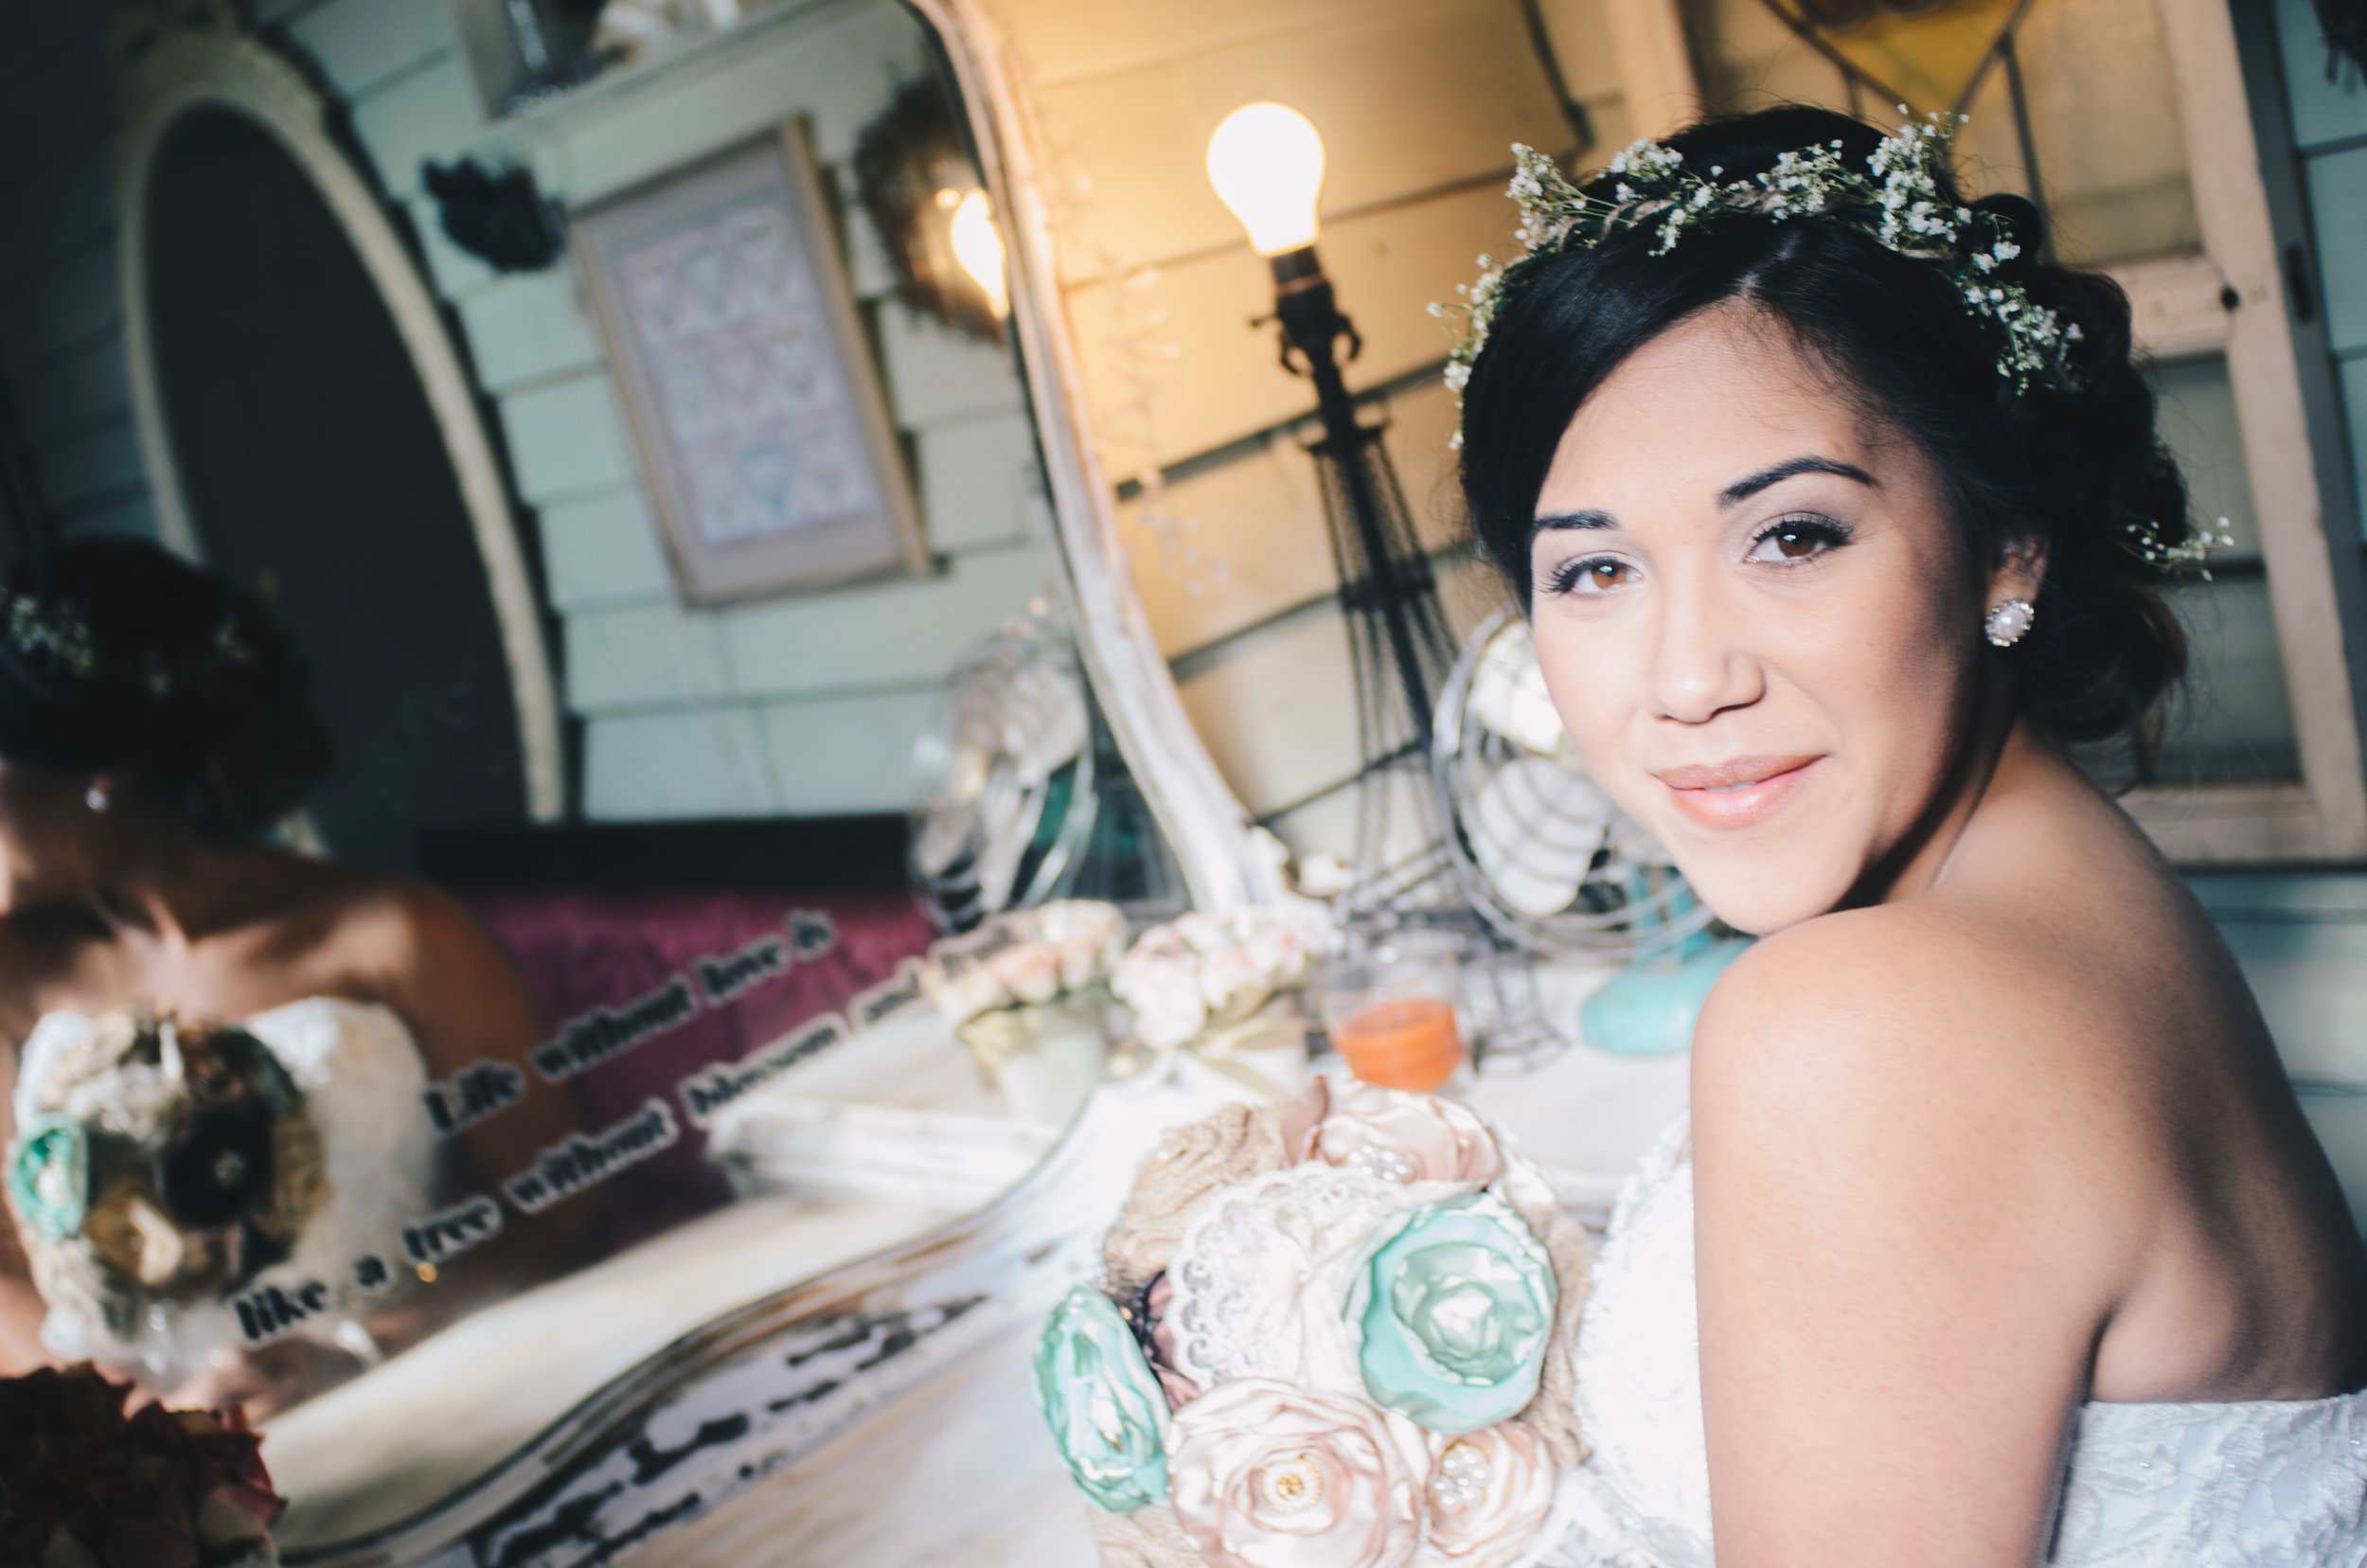 central-fl-christian-wedding-day-17.jpg